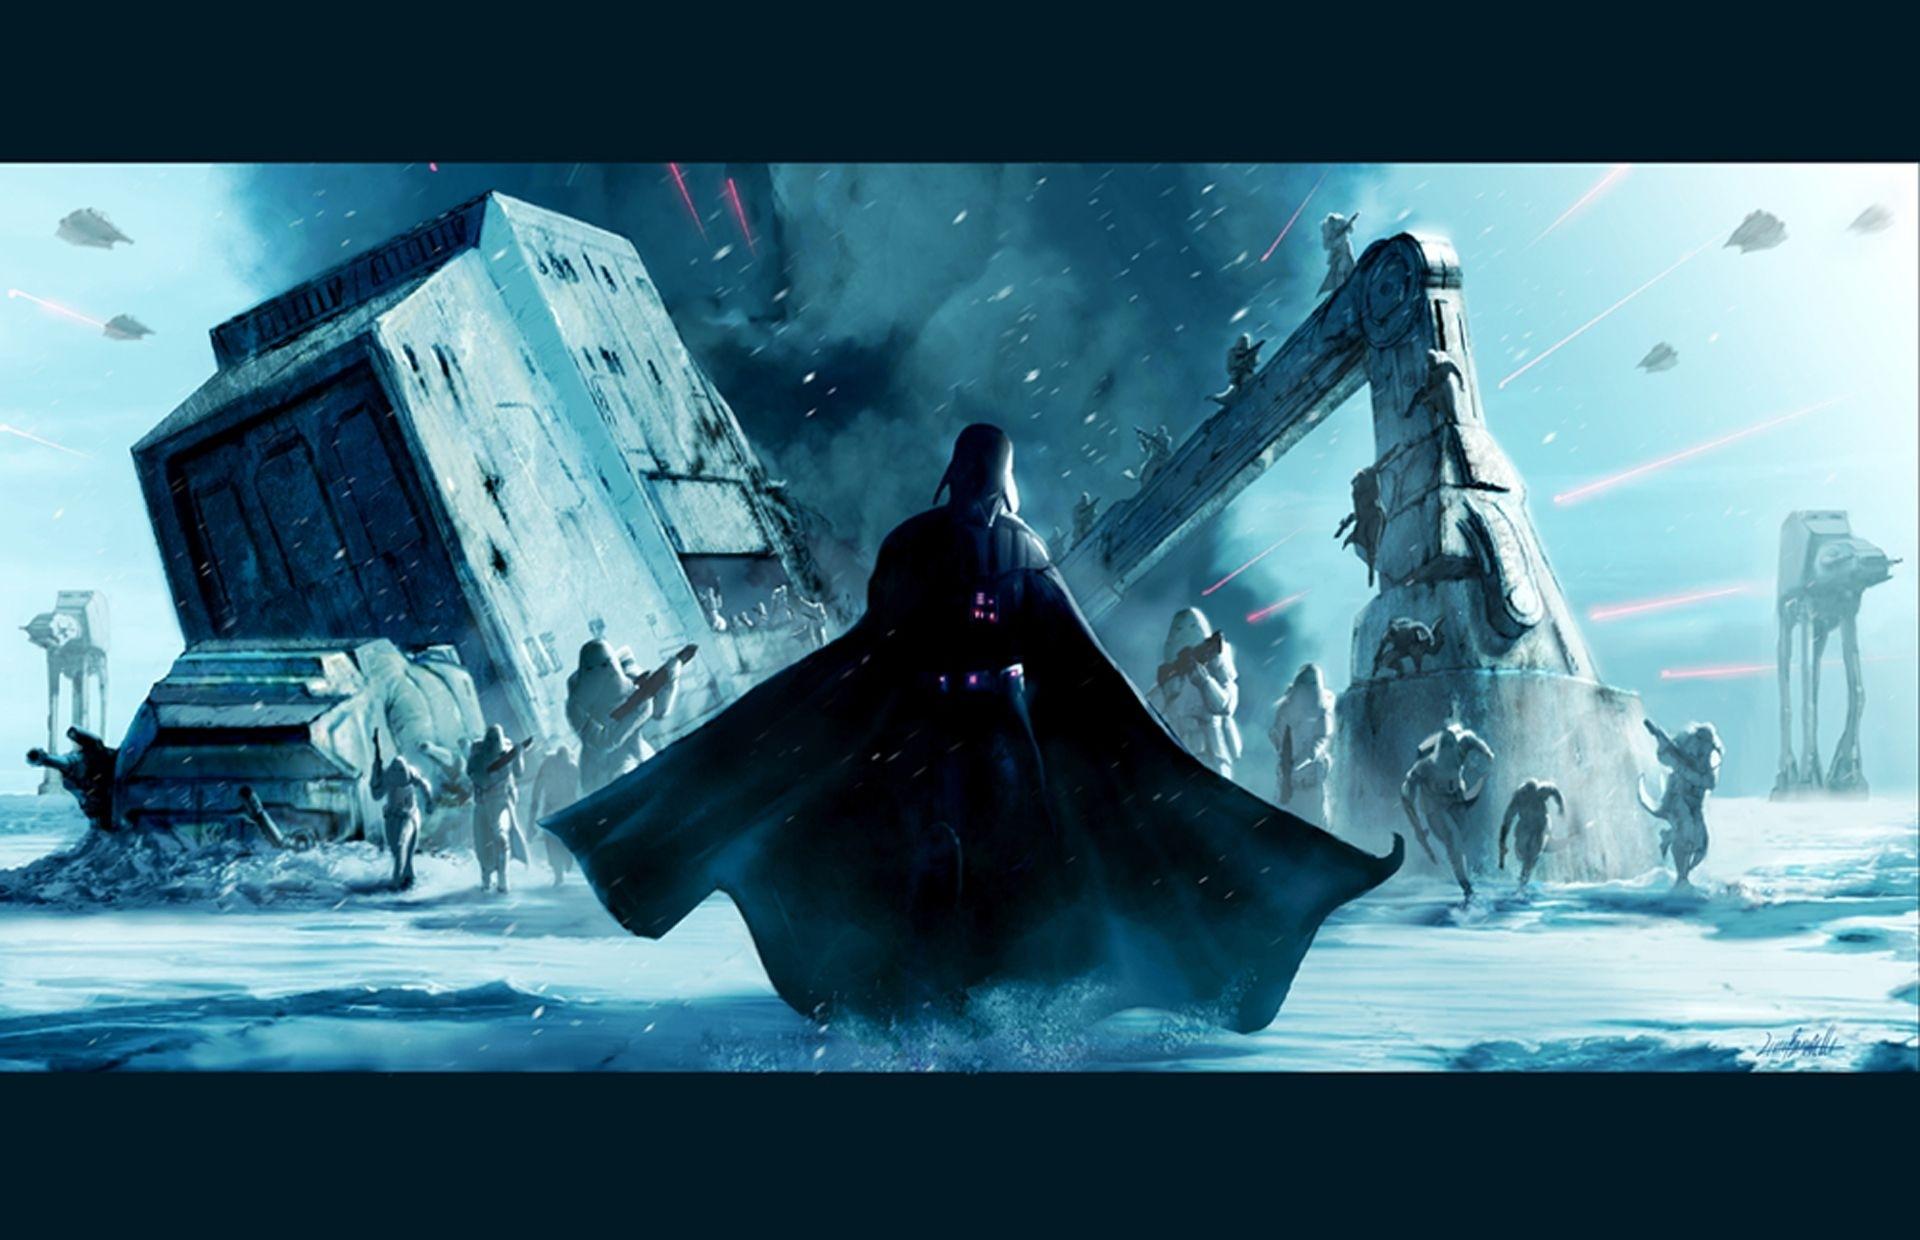 el imperio contra ataca   star wars   pinterest   star, starwars and